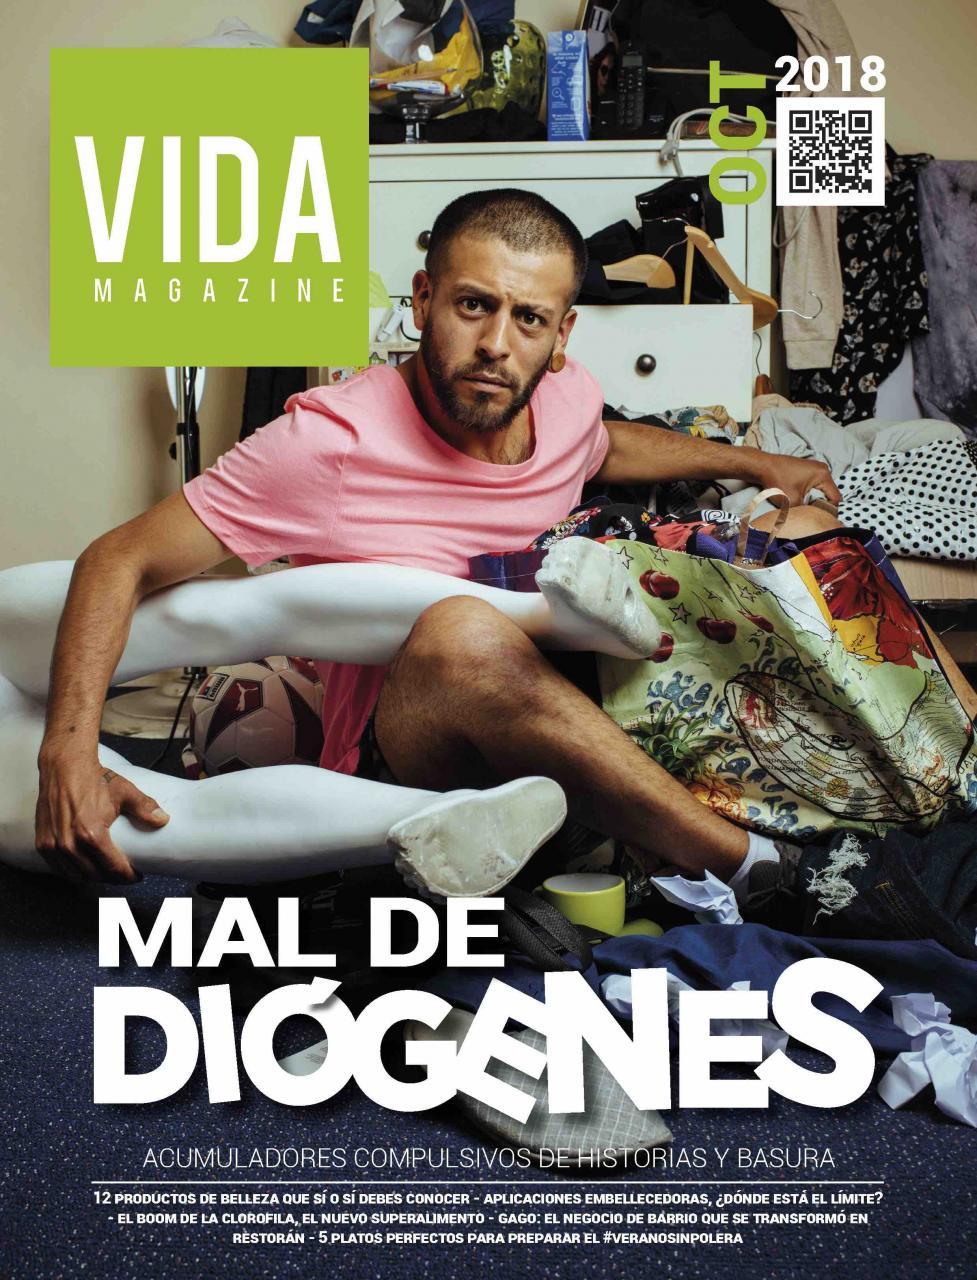 vida-magazine-edicion-n49